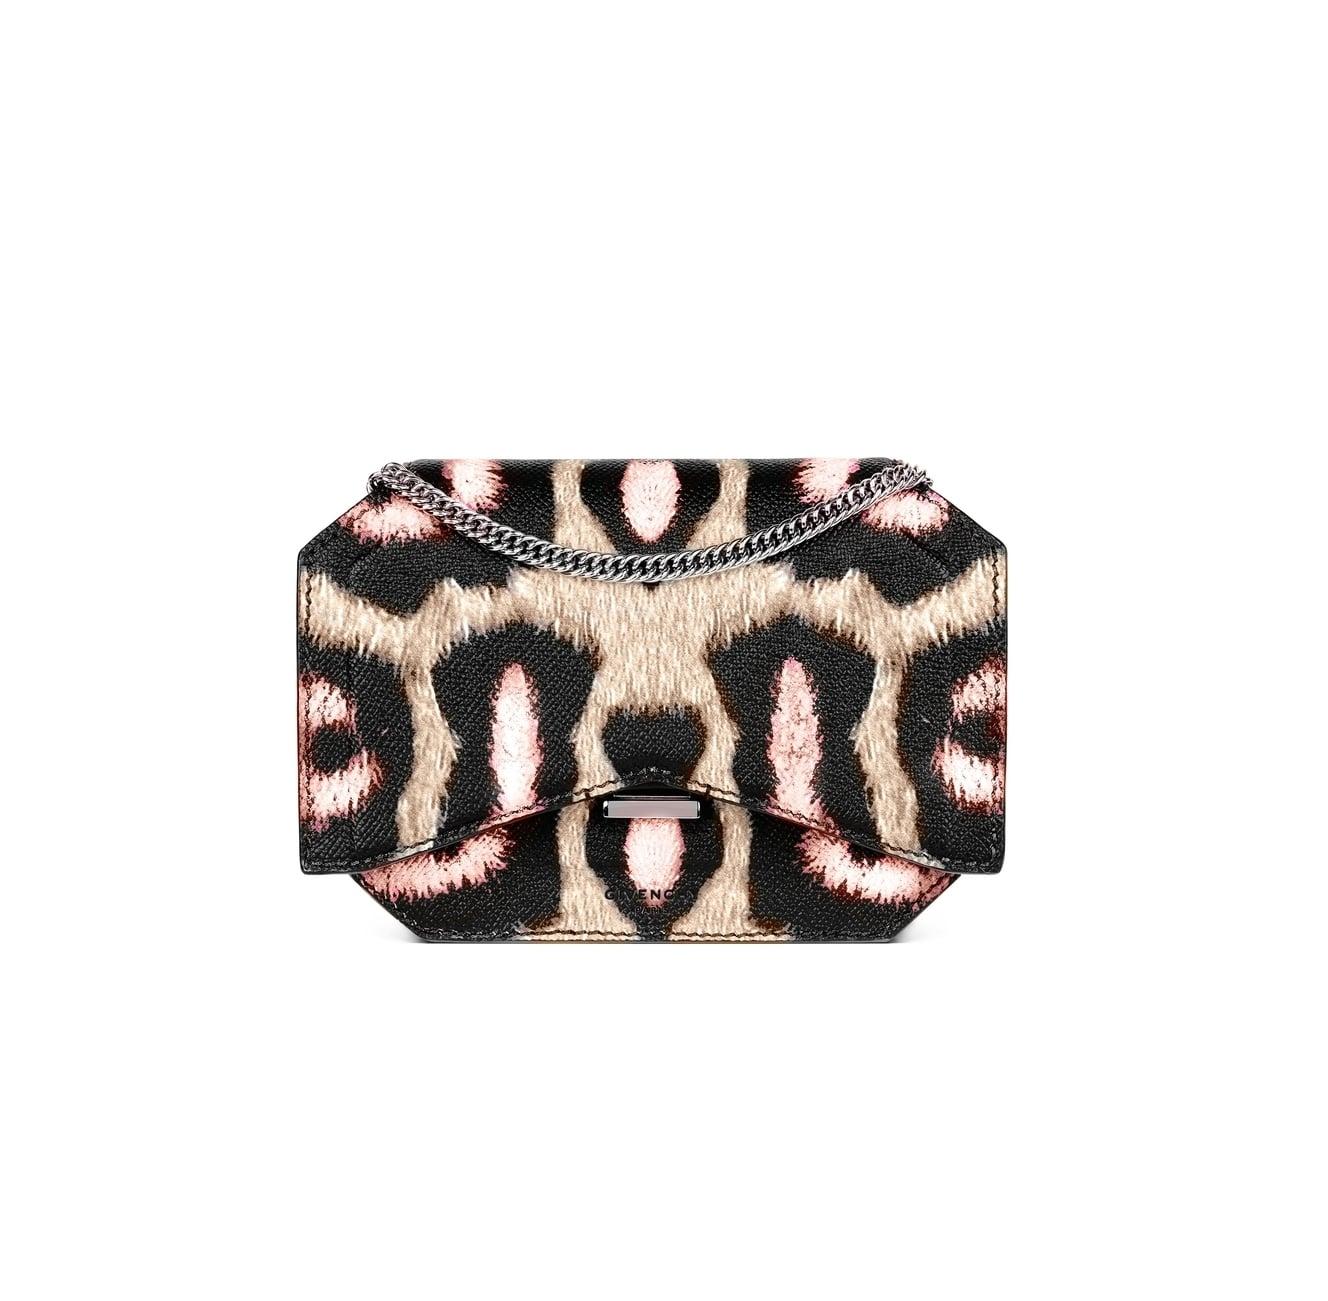 pin gucci bag gussied all bamboo up jaguar handbags top handle print